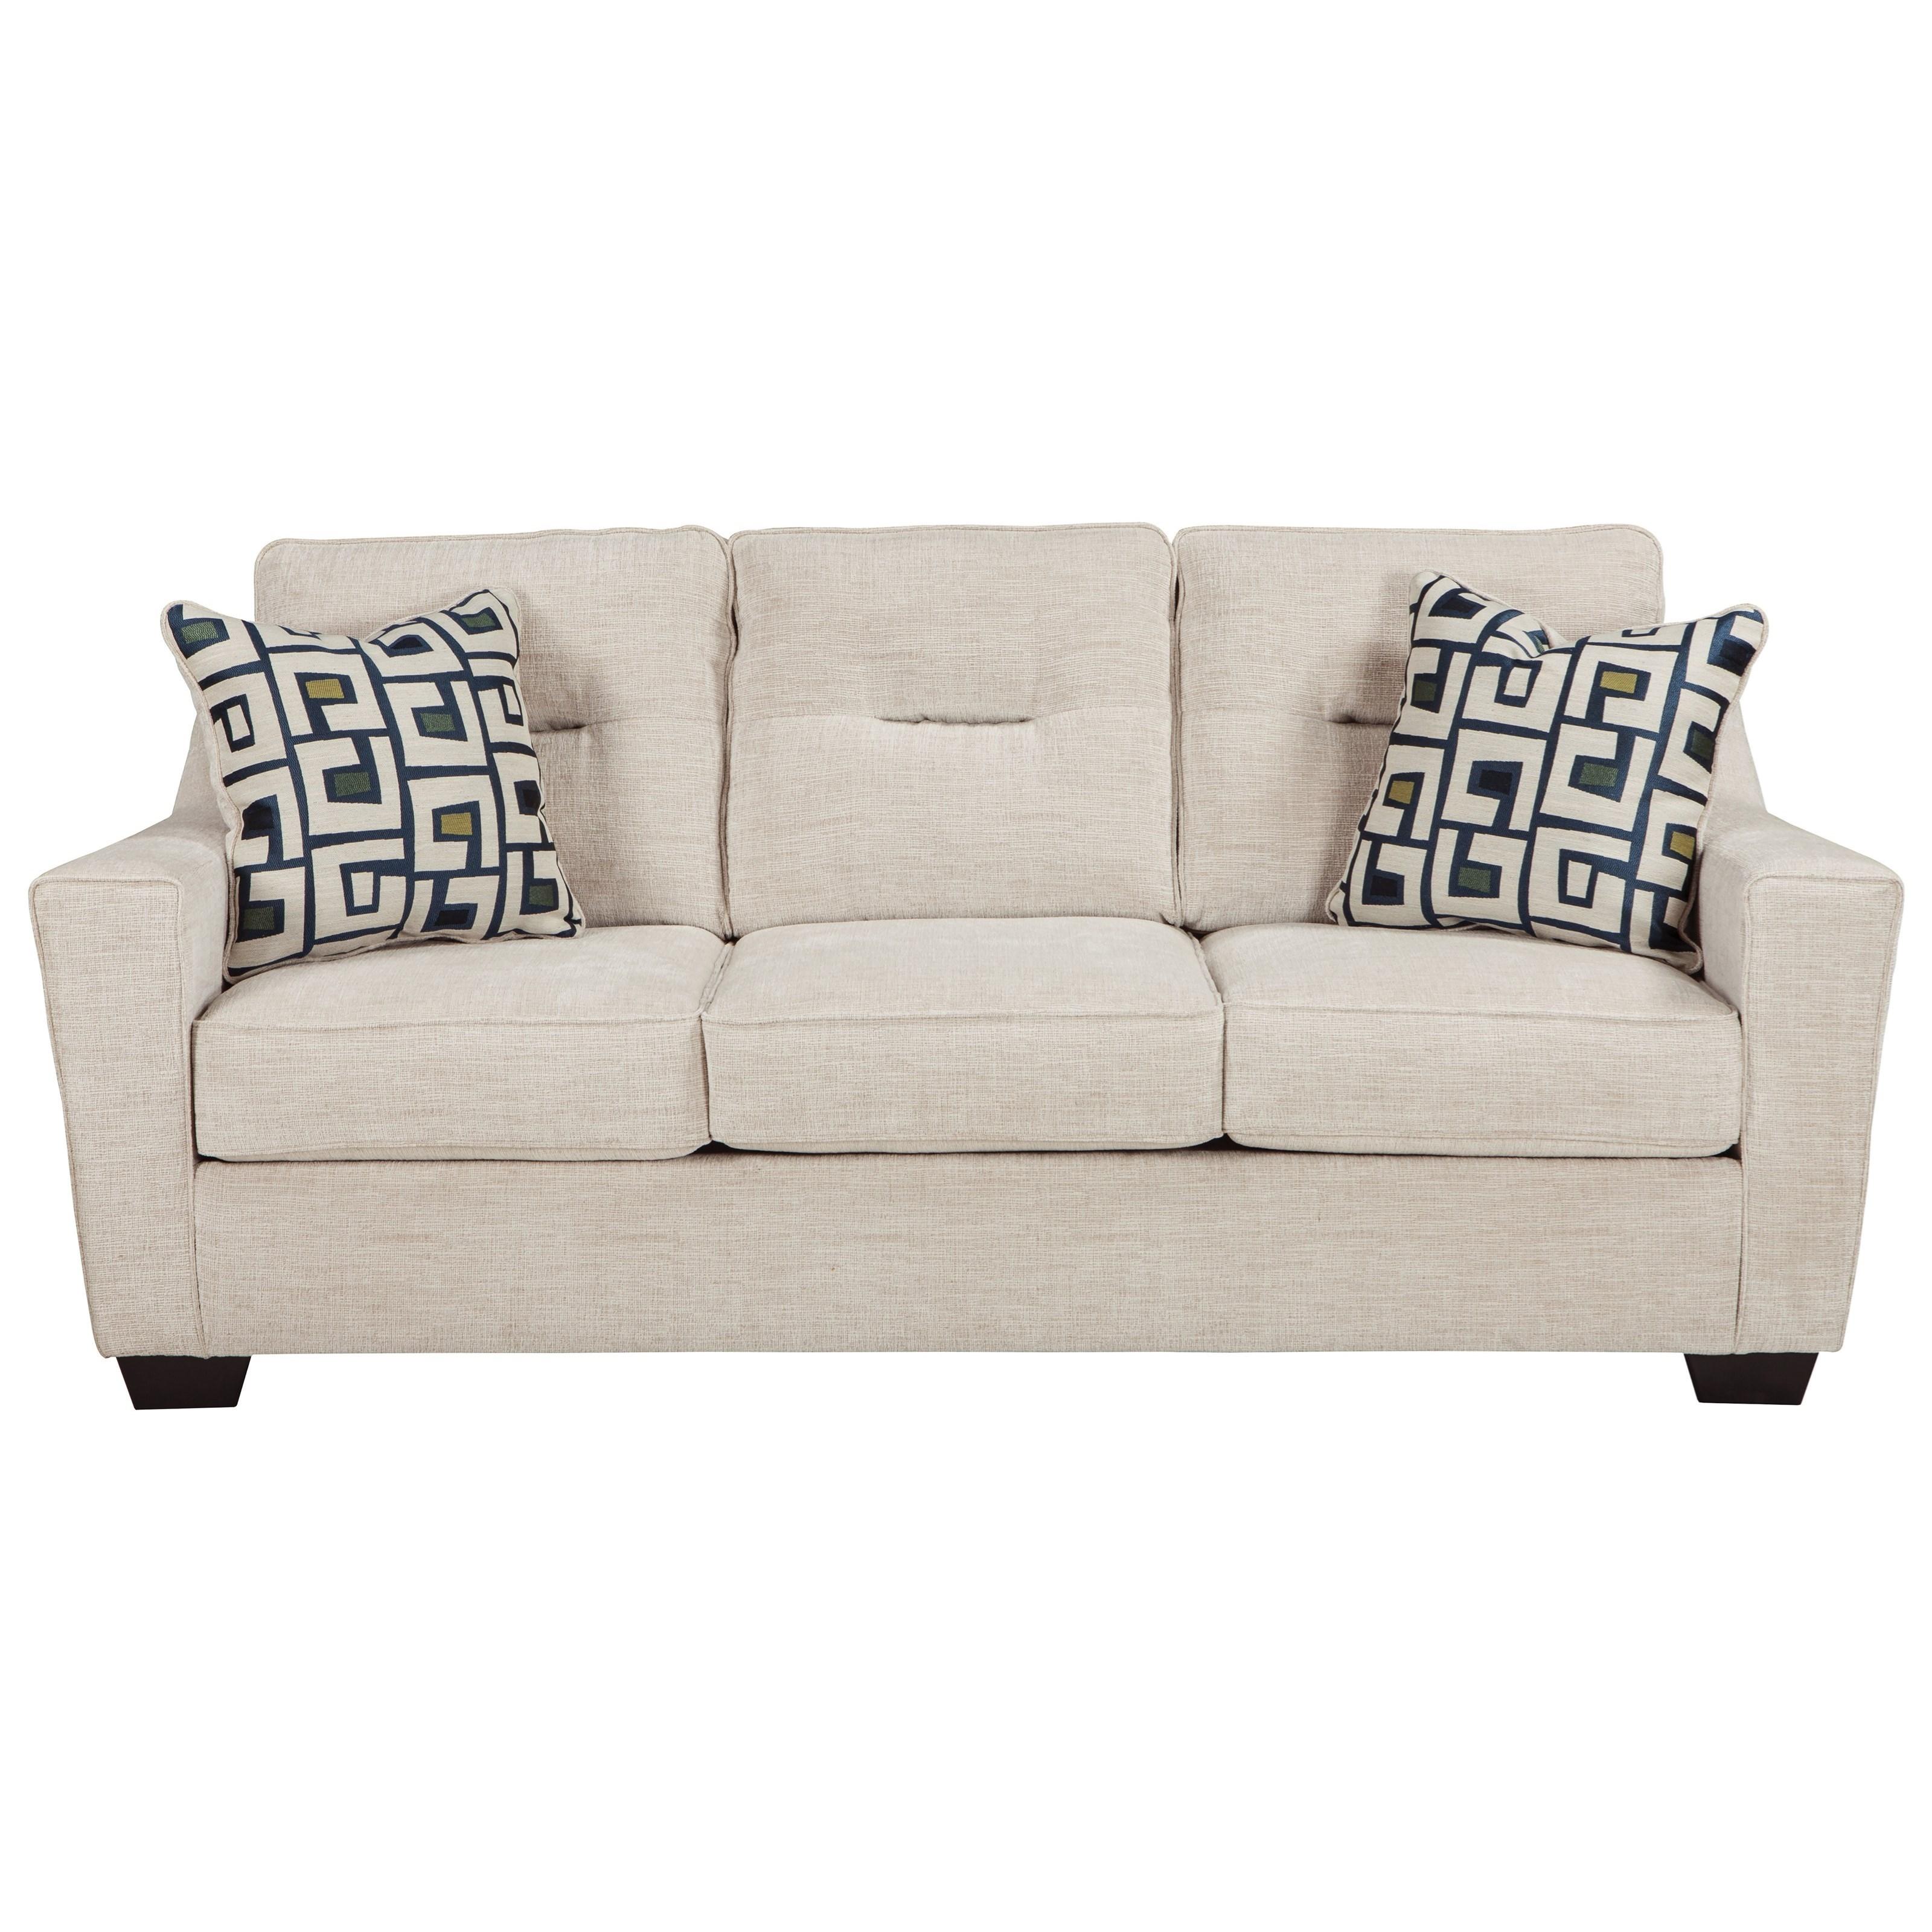 ashley furniture commando black sofa art ltd bed talentneeds